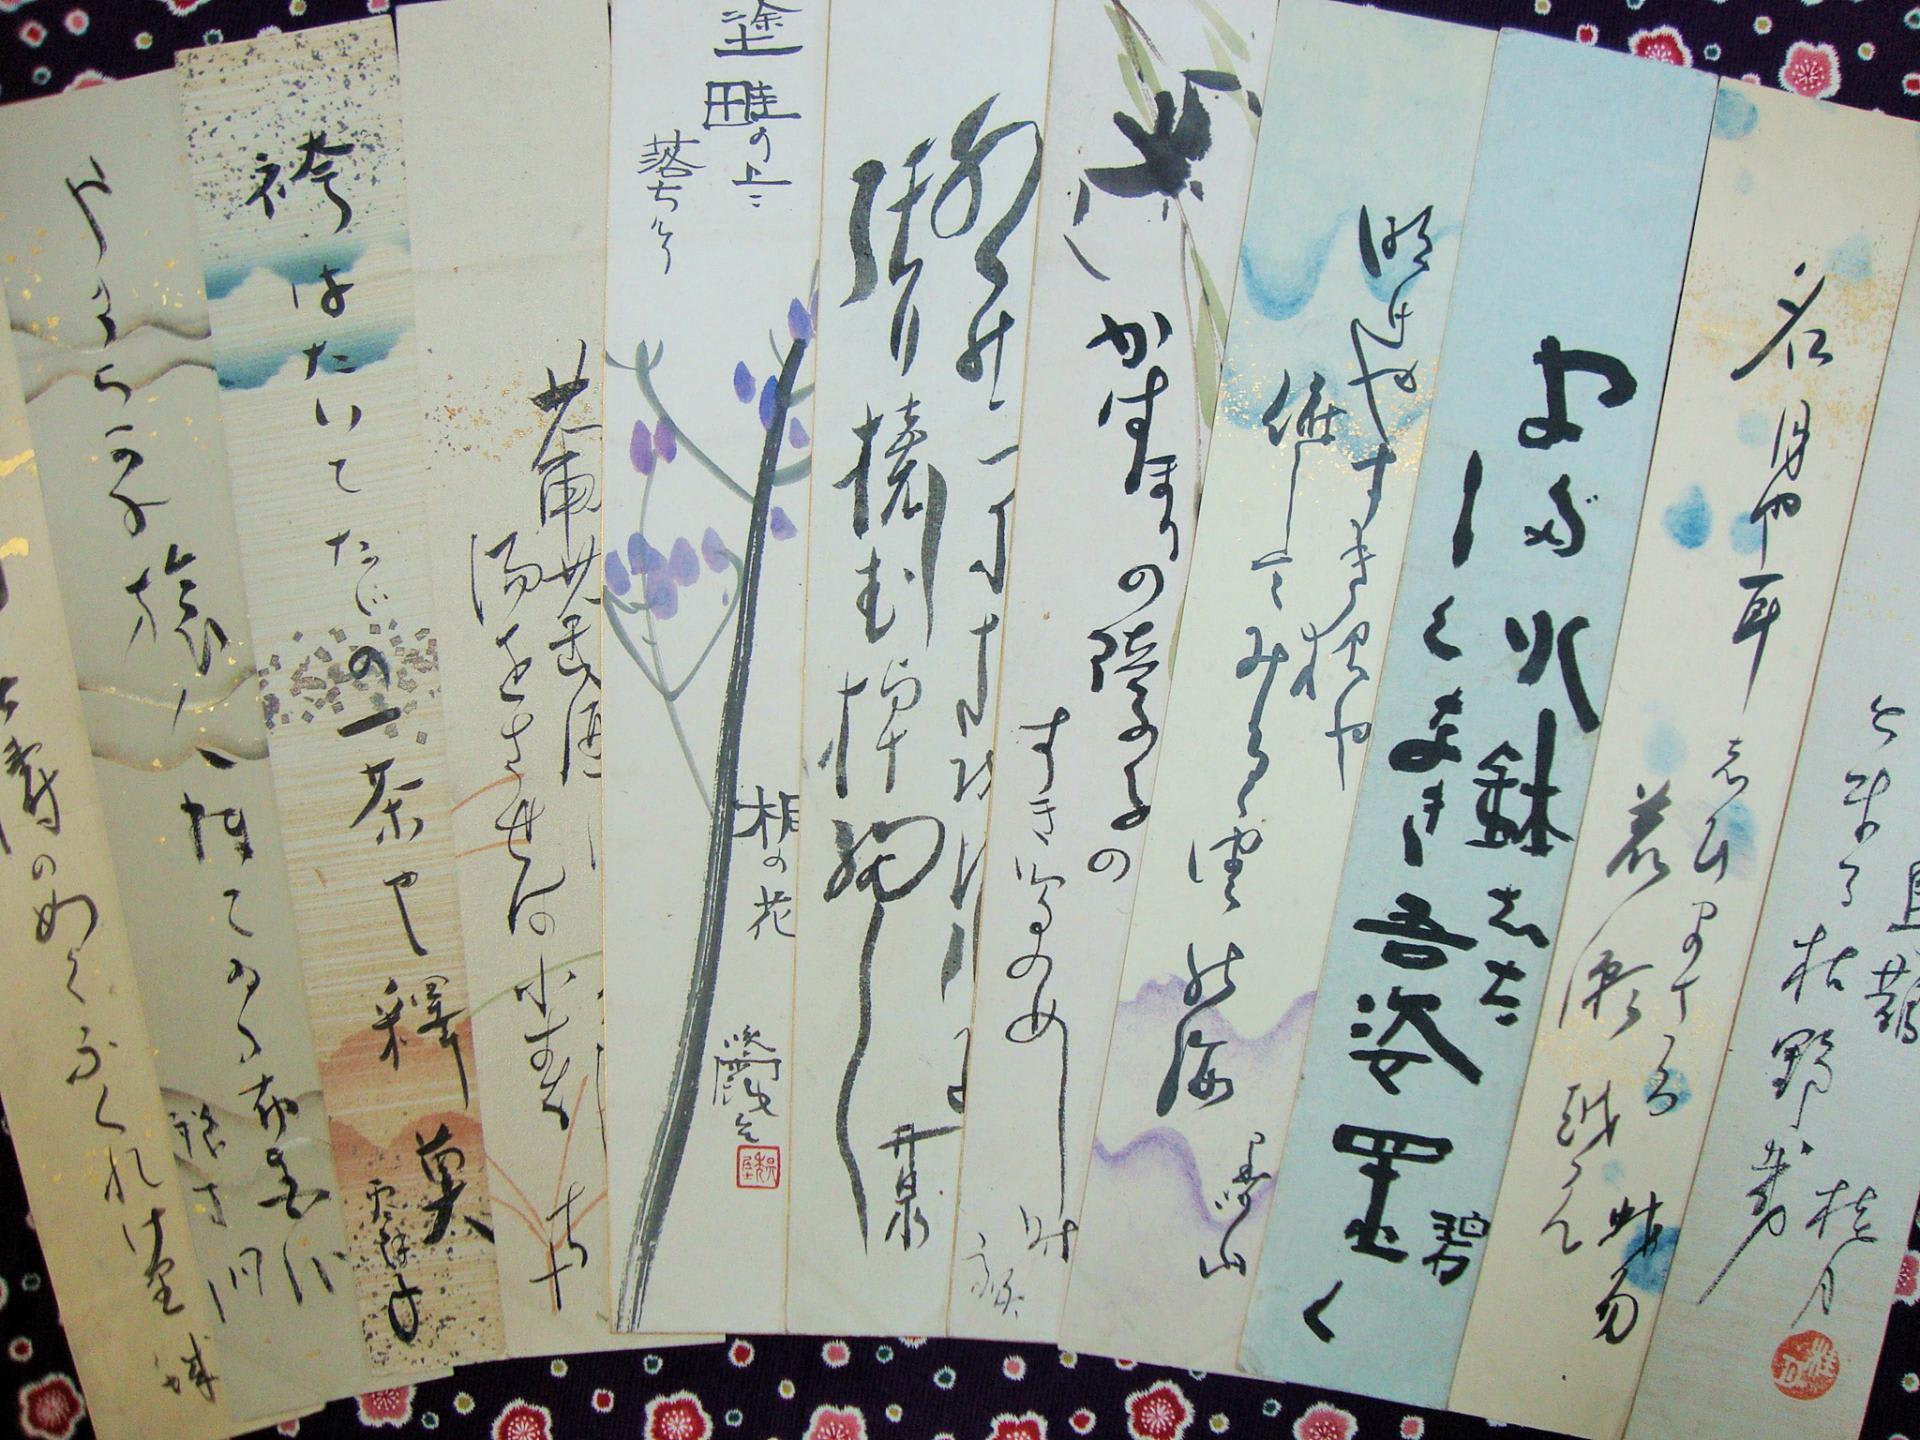 http://blogimg.goo.ne.jp/user_image/45/70/49d8a419143877ecd2f554fb562c8ea4.jpg